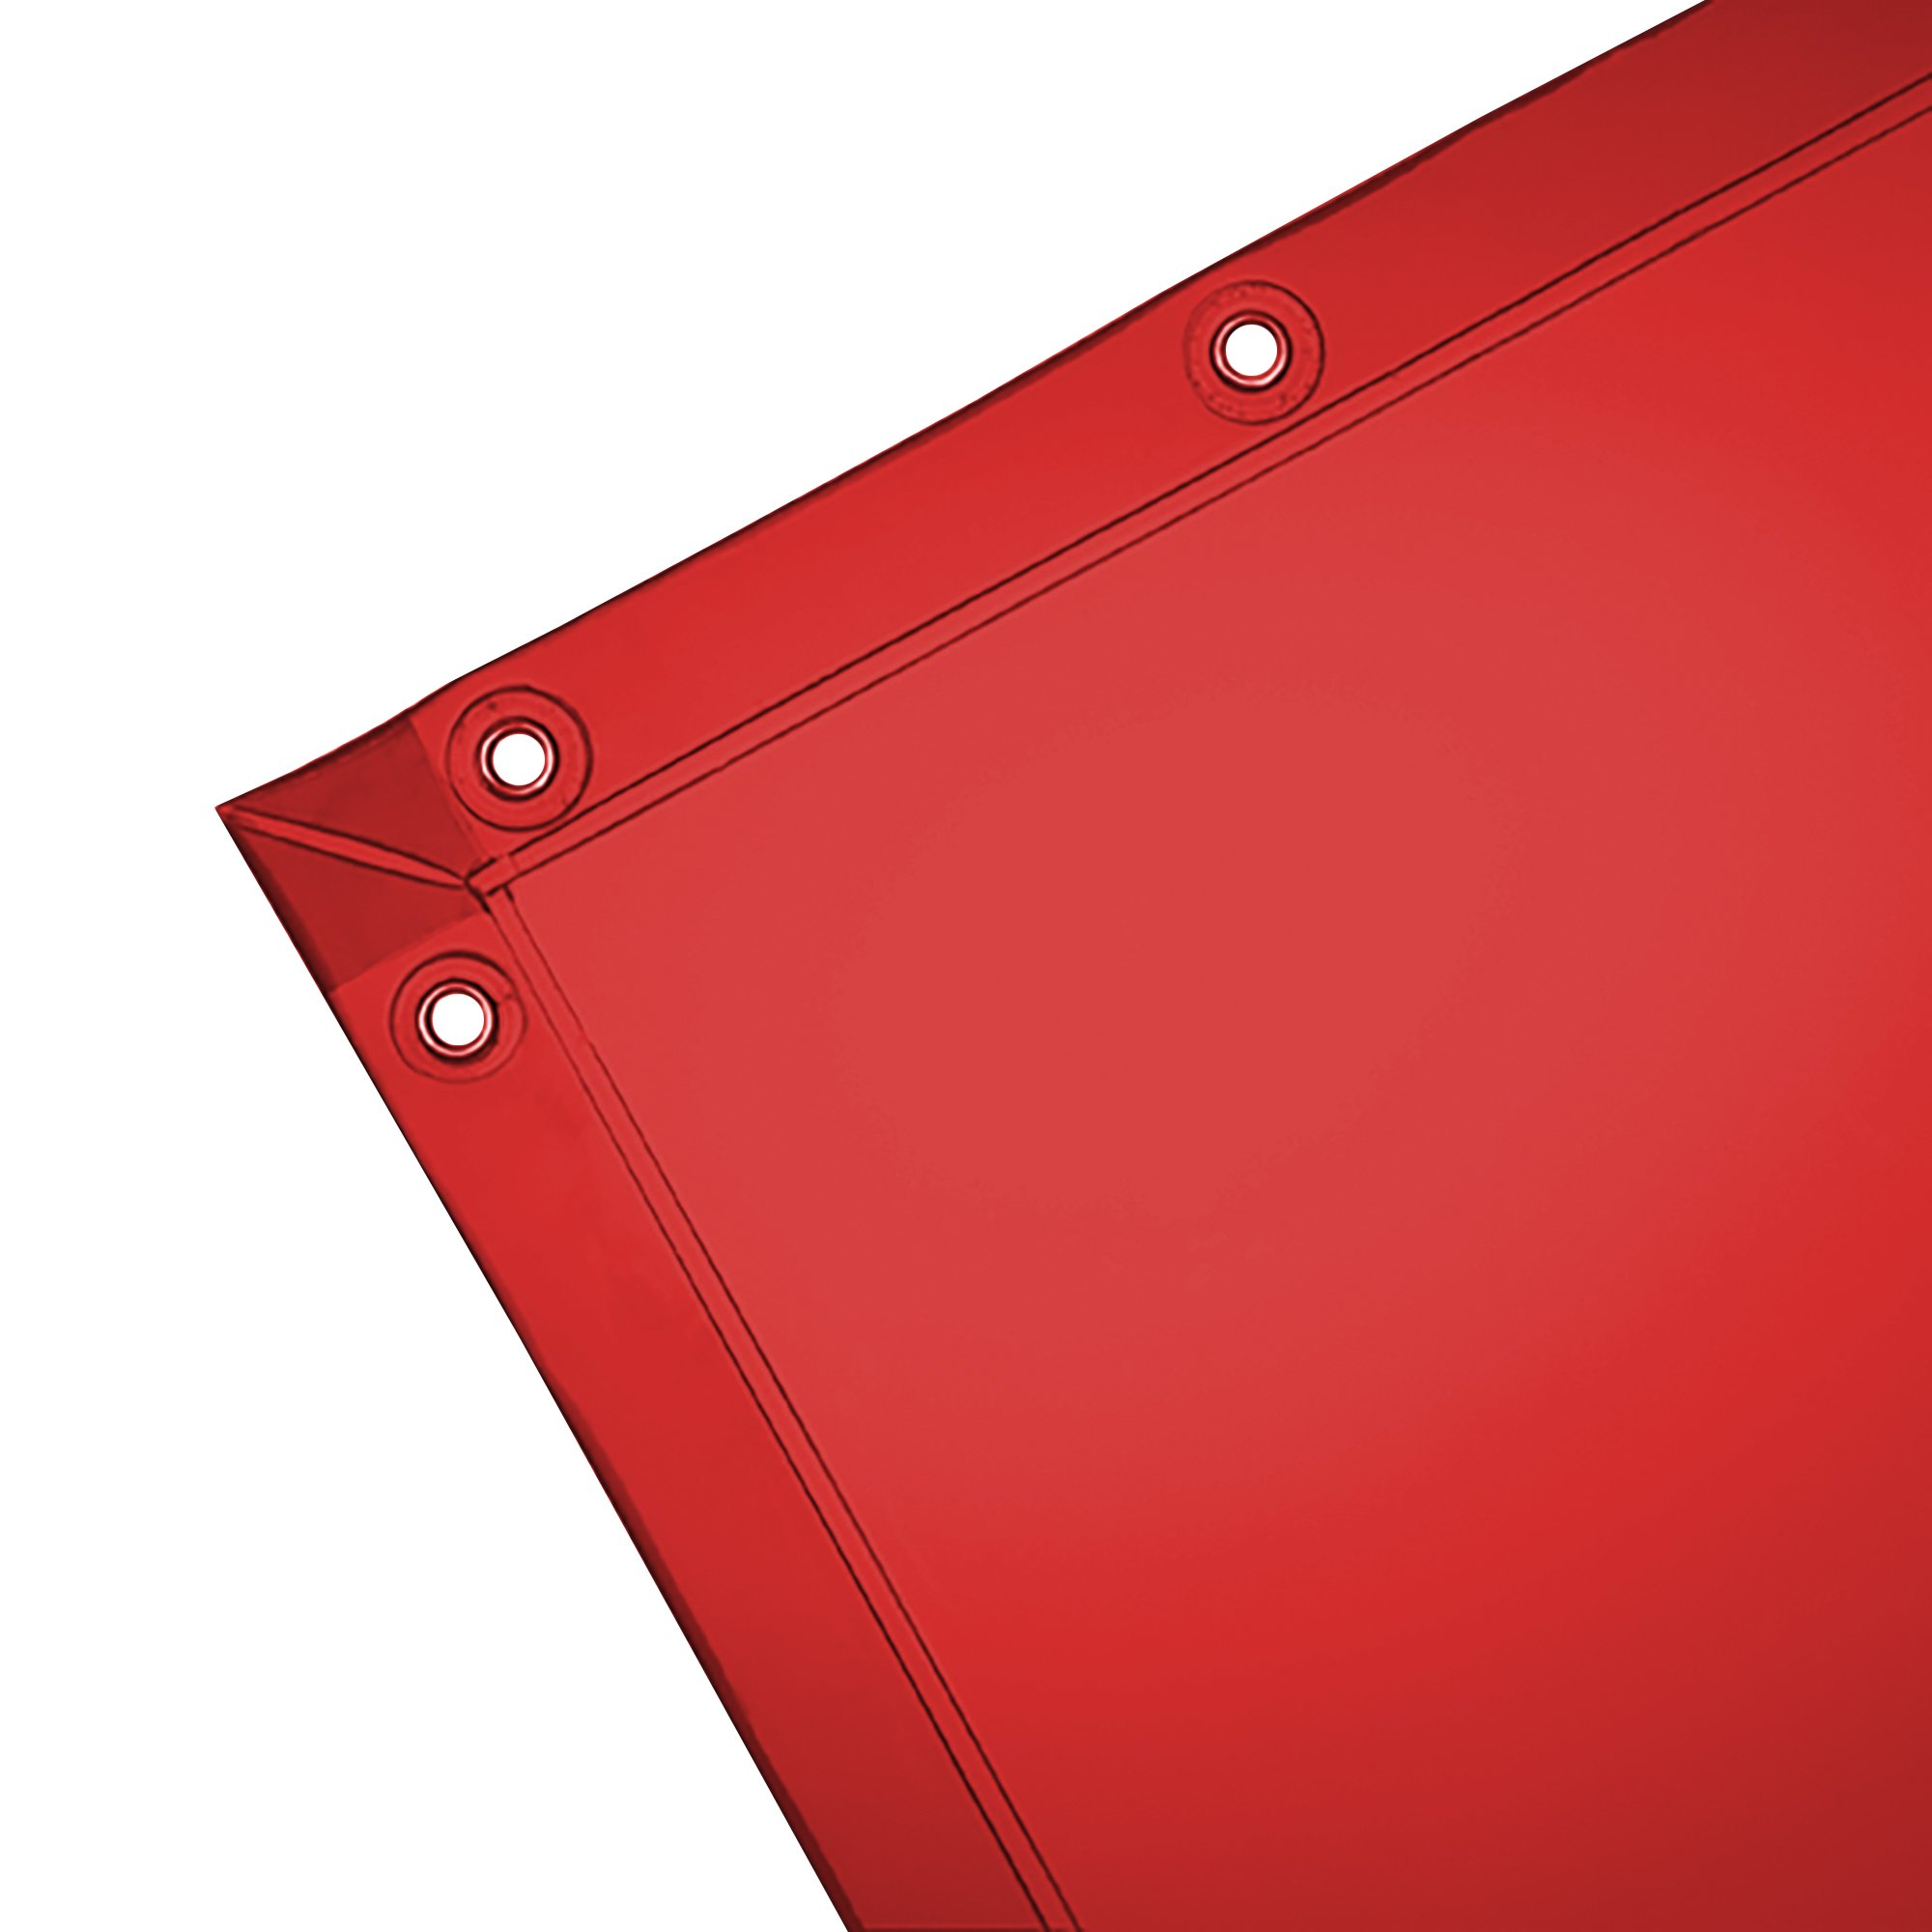 Wilson 14-Mil See-Thru Welding Curtain (36292), 6 x 6 feet, Orange Vinyl Curtain, Standard Grommets, 1 / Bag, 10 / Case by Kimberly-Clark Professional